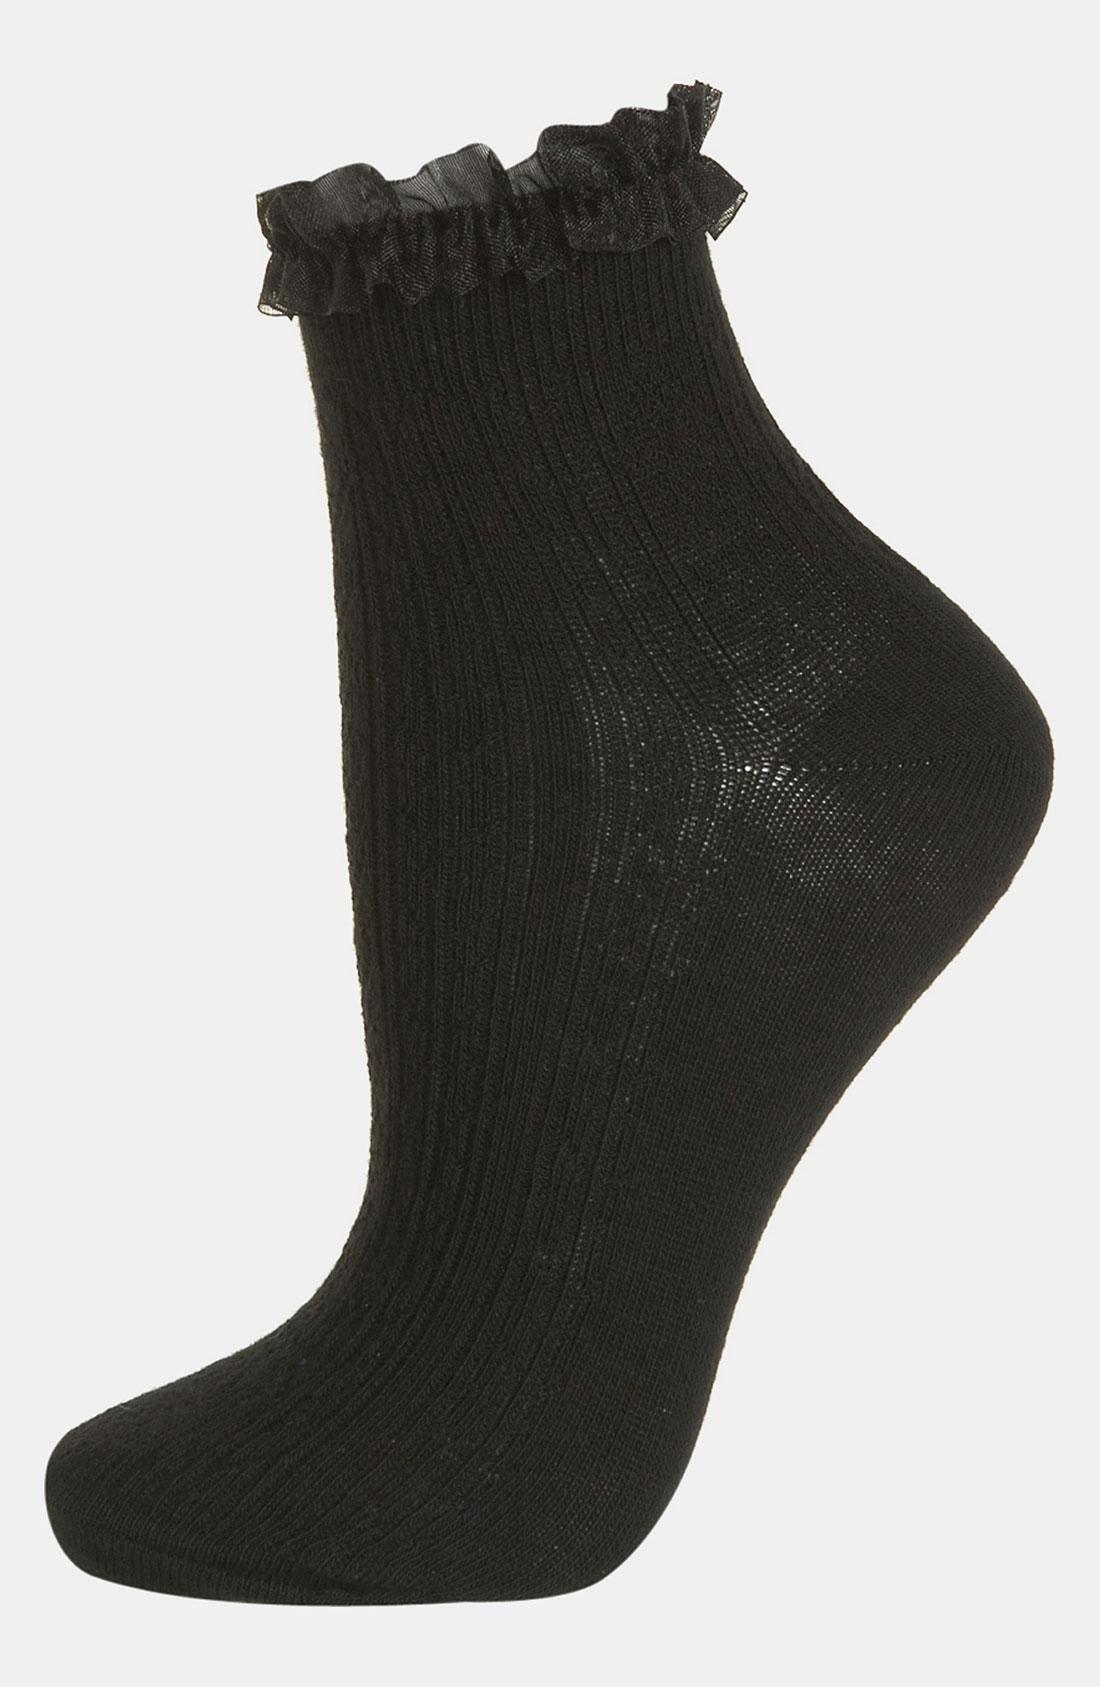 Topshop Black Lace Trim Ankle Socks in Black   Lyst